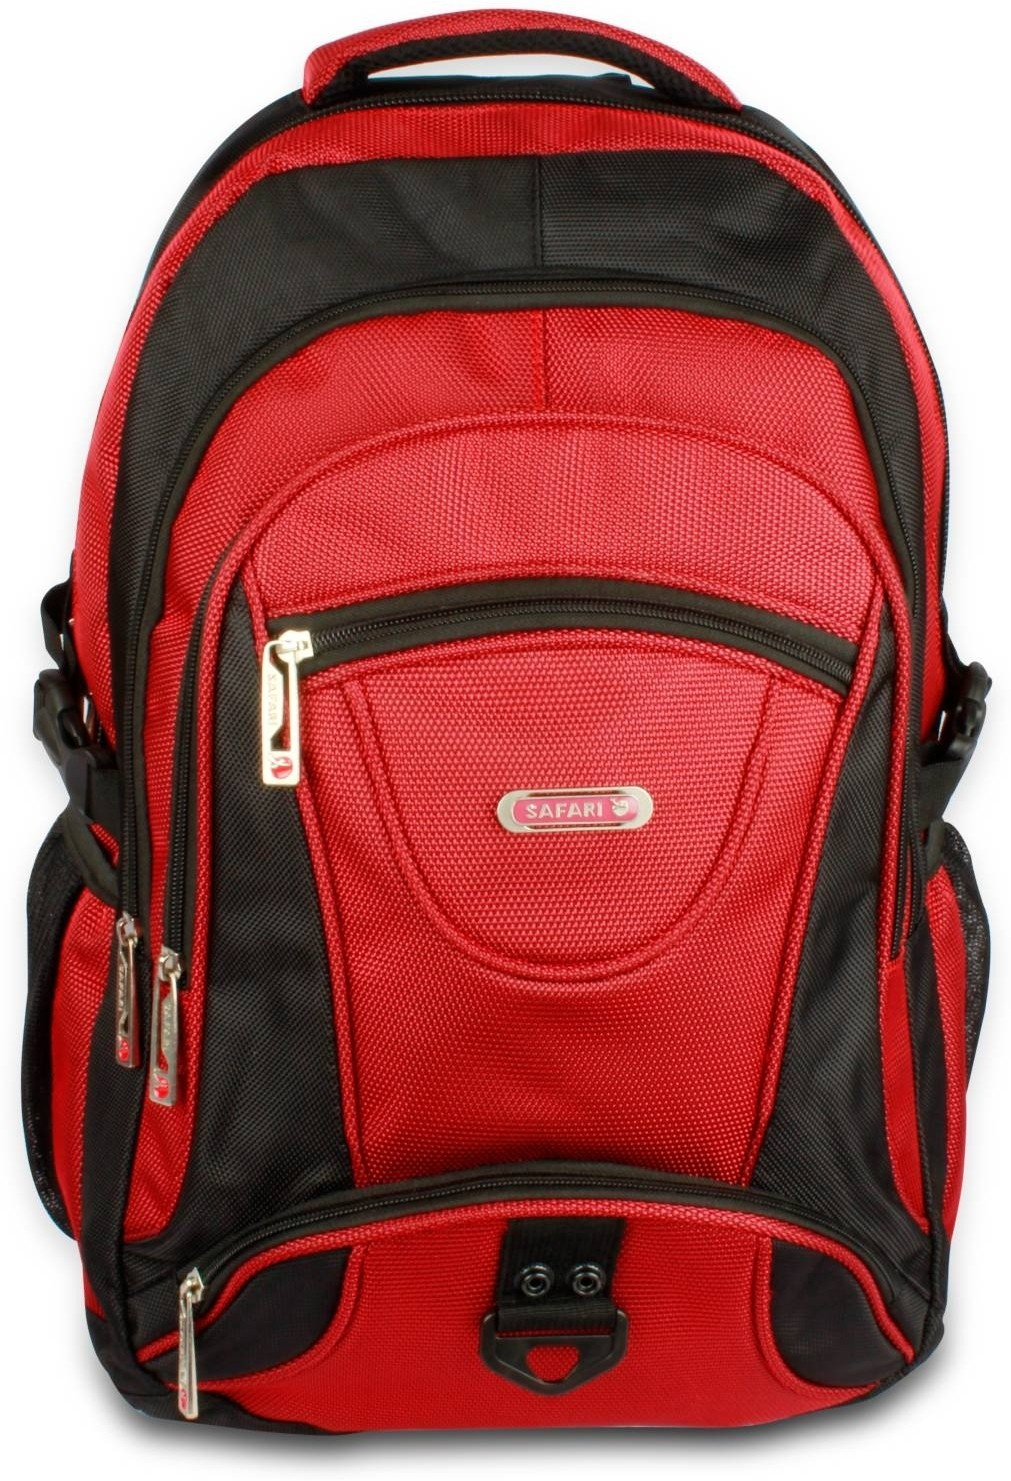 6ca73fe3ee83 Buy Safari Chase 108 26.9 L Medium Laptop Backpack Black